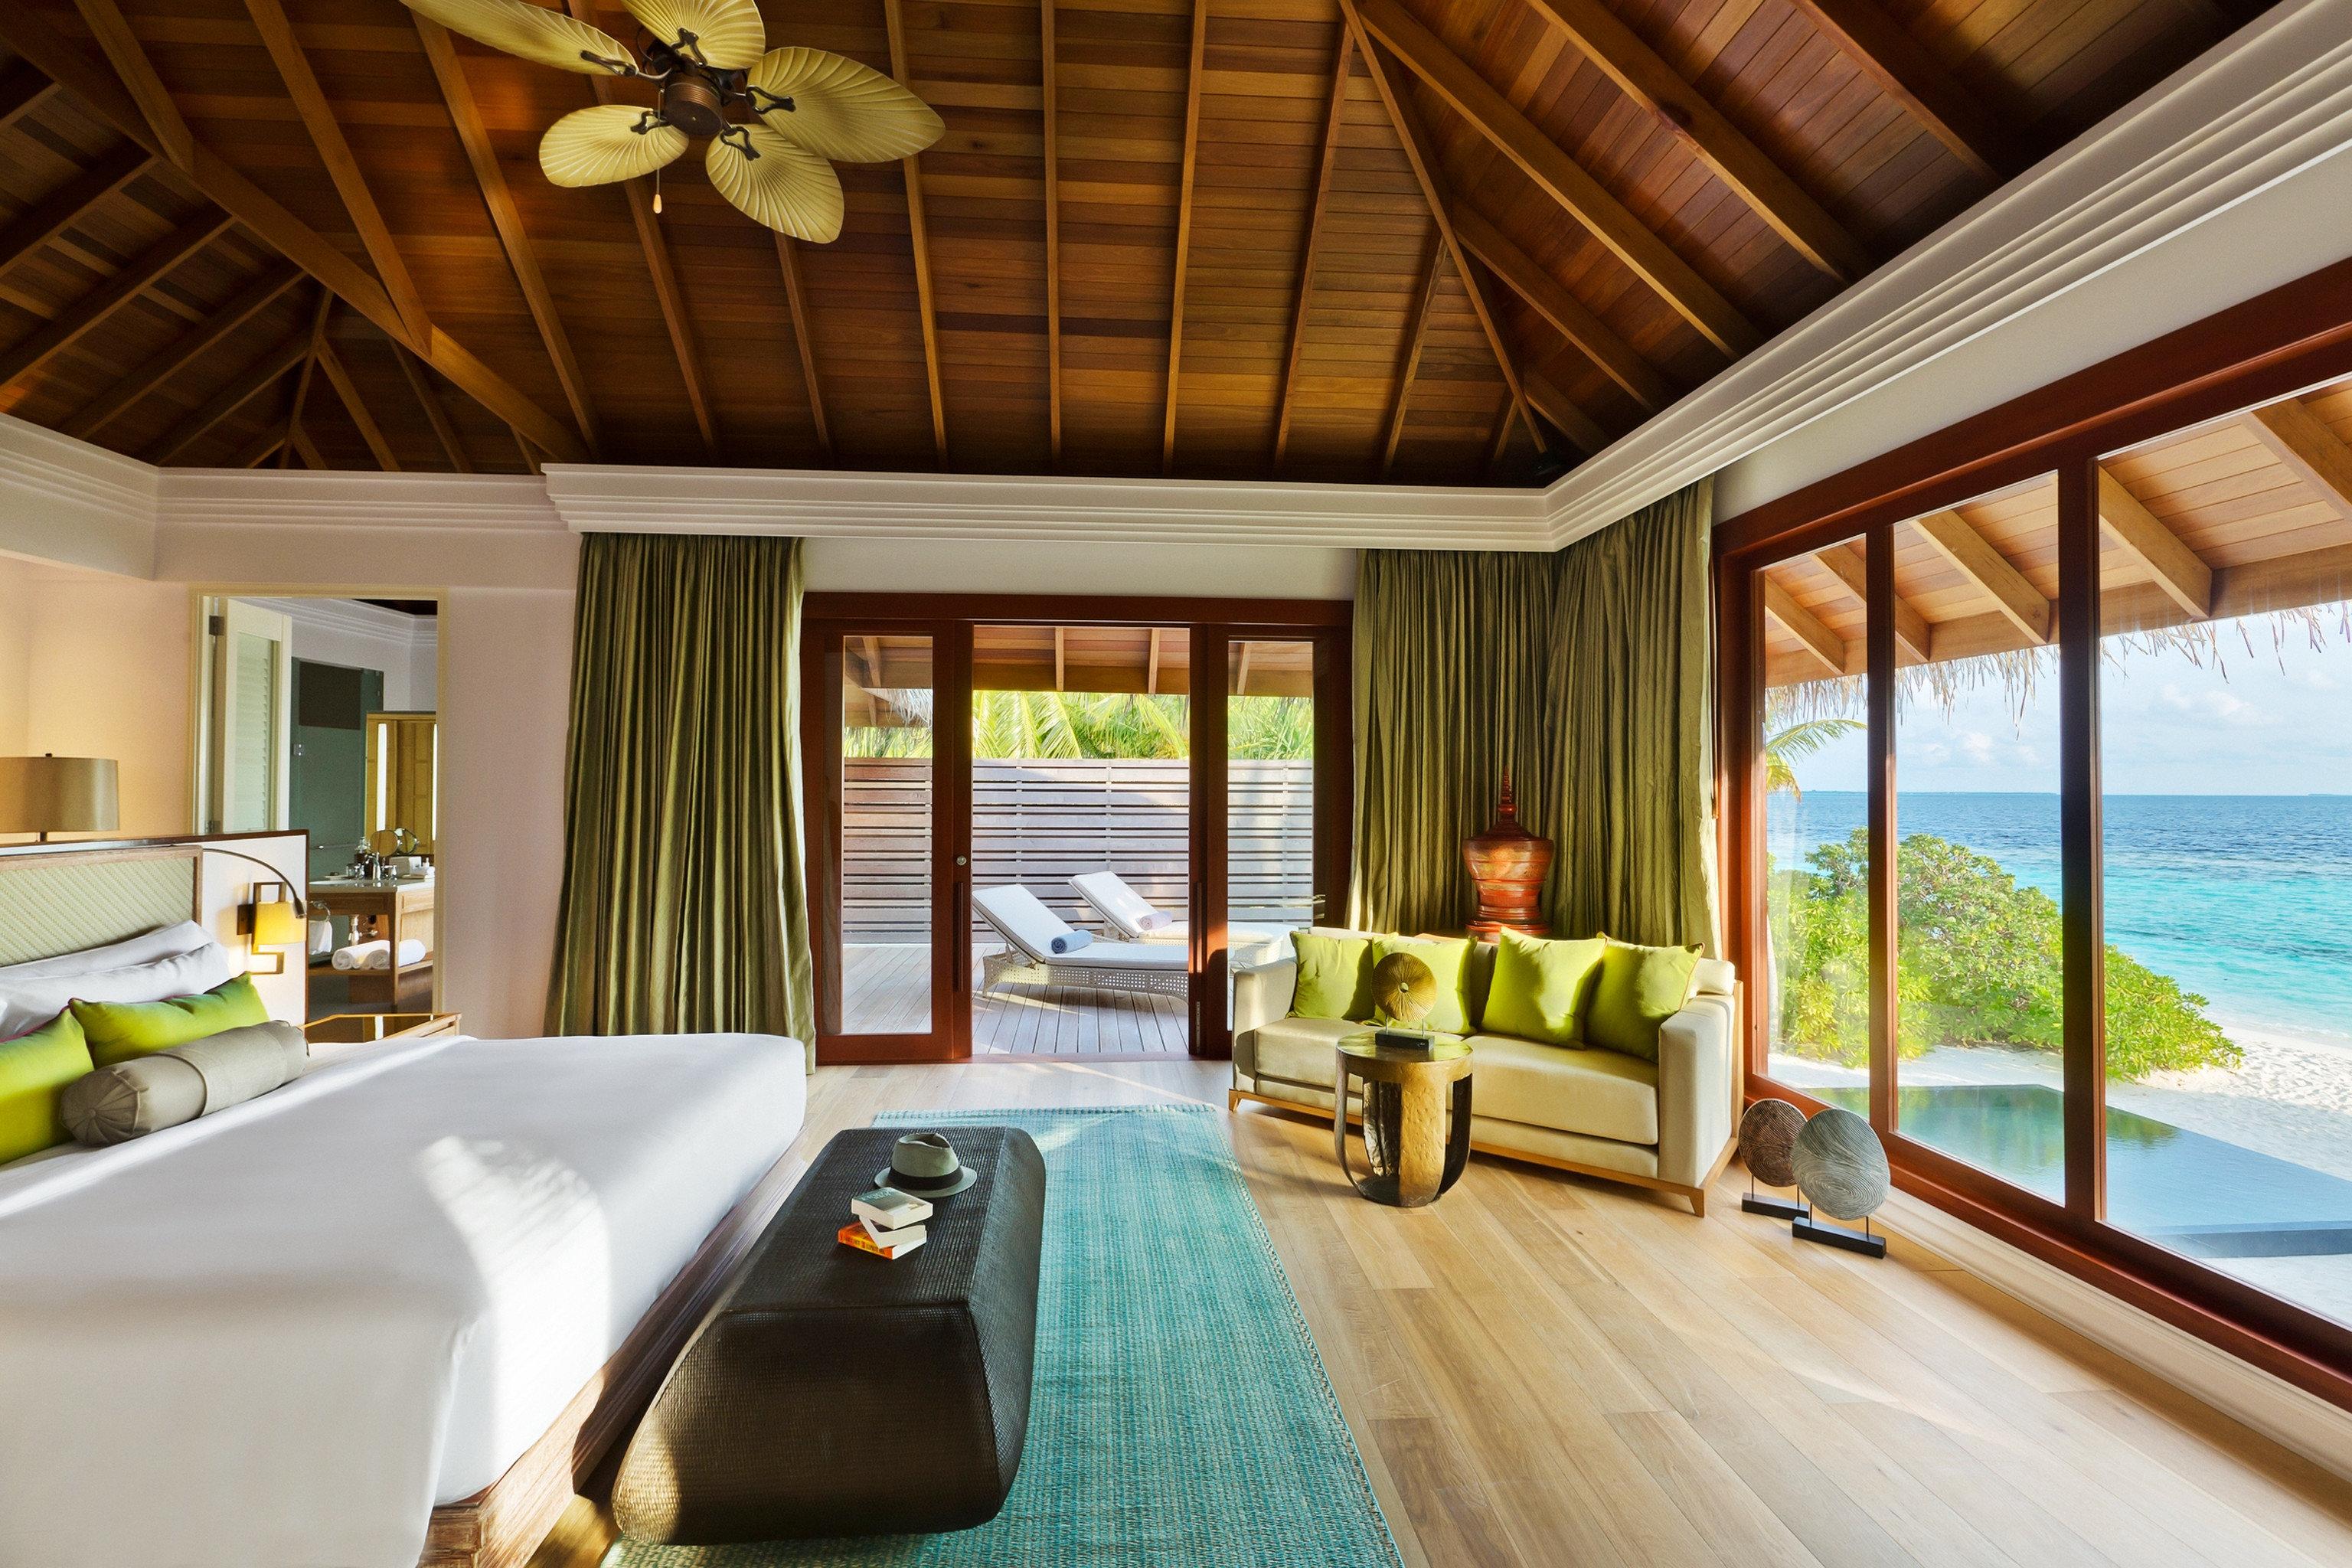 Bedroom Honeymoon Luxury Resort Romance Romantic property swimming pool Villa home Suite cottage condominium mansion eco hotel